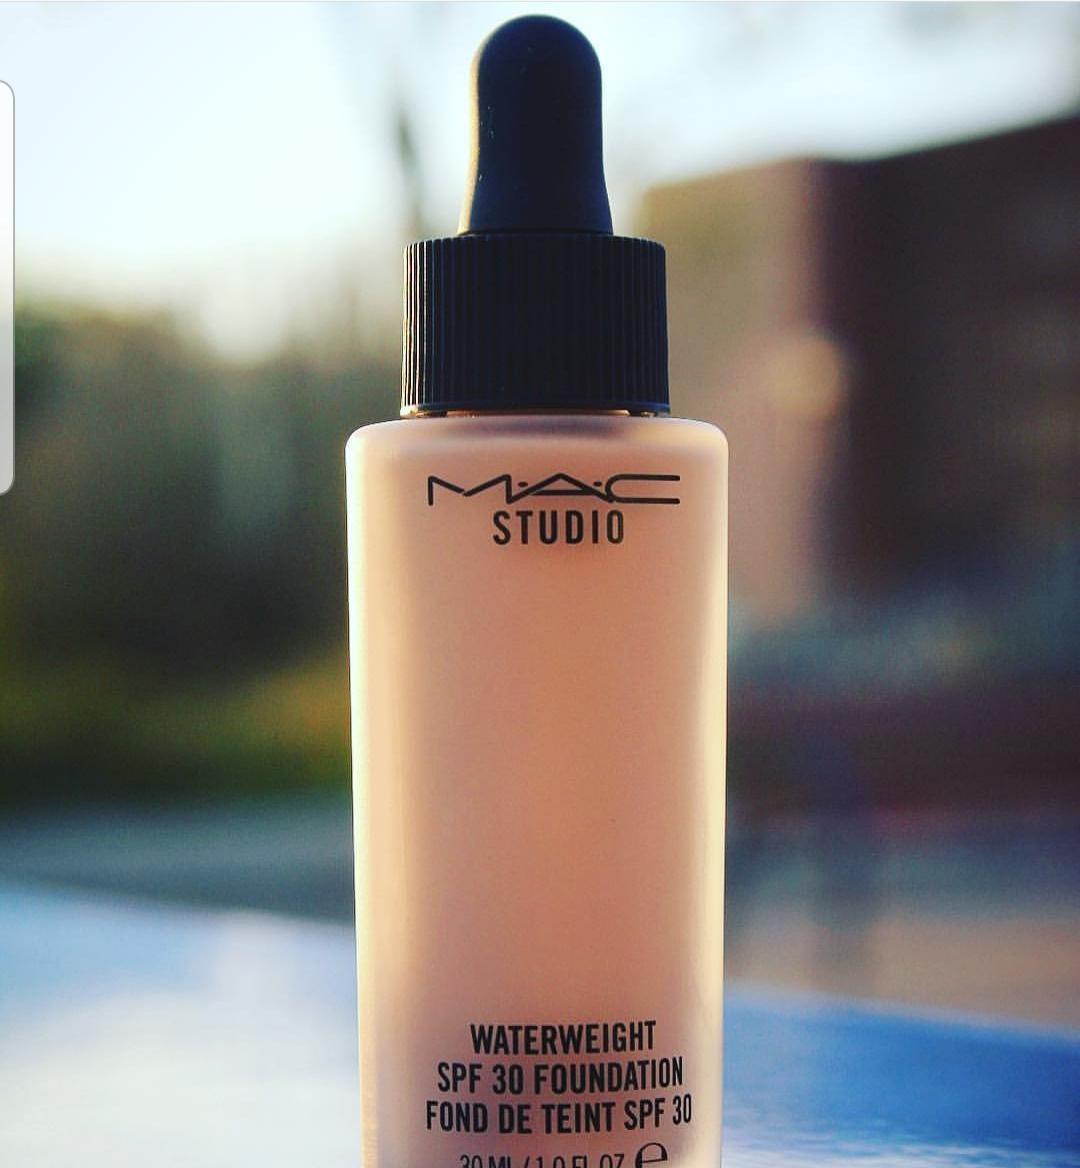 MAC Studio Waterweight Concealer-Good and best-By avyuktha